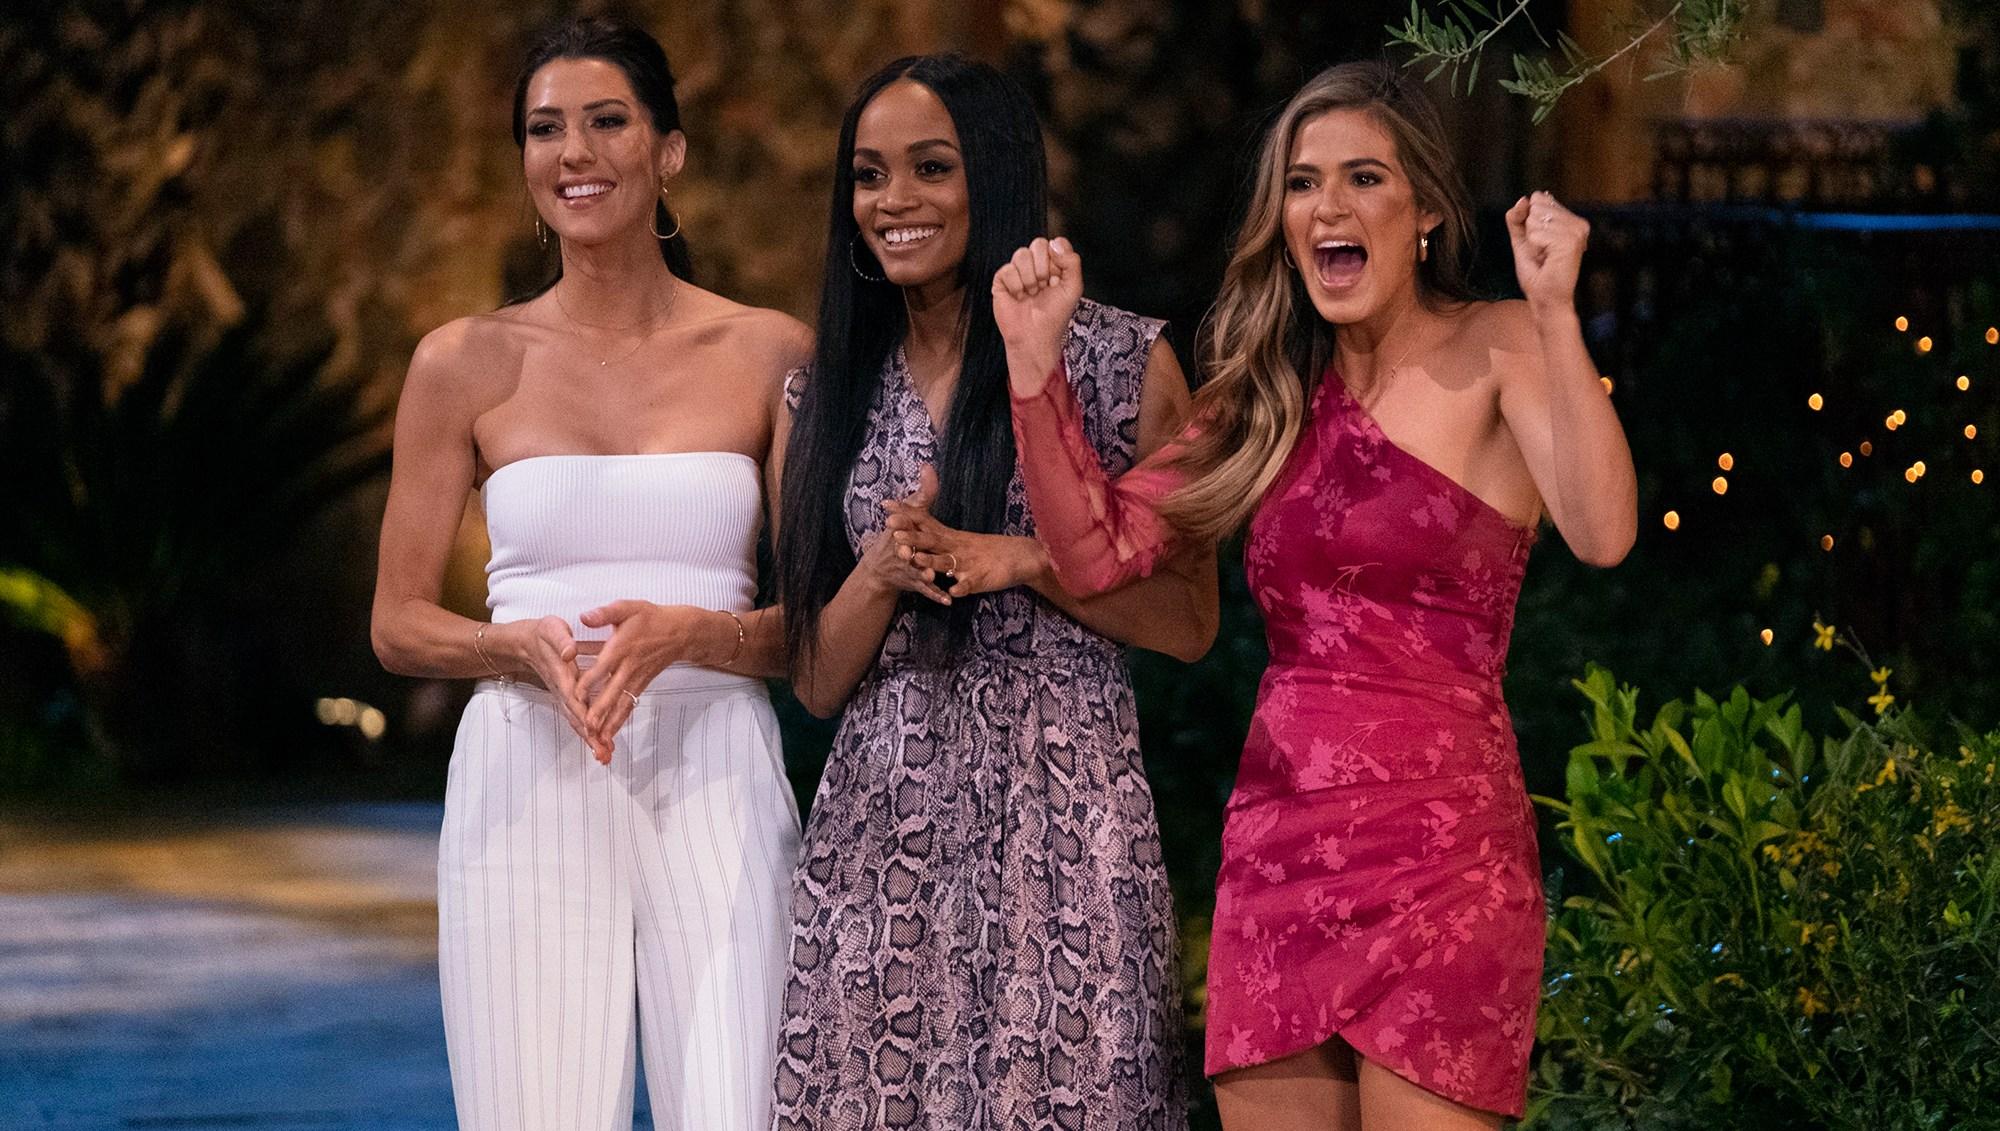 Bachelorette Reunion Made Rachel Lindsay 'Sad'